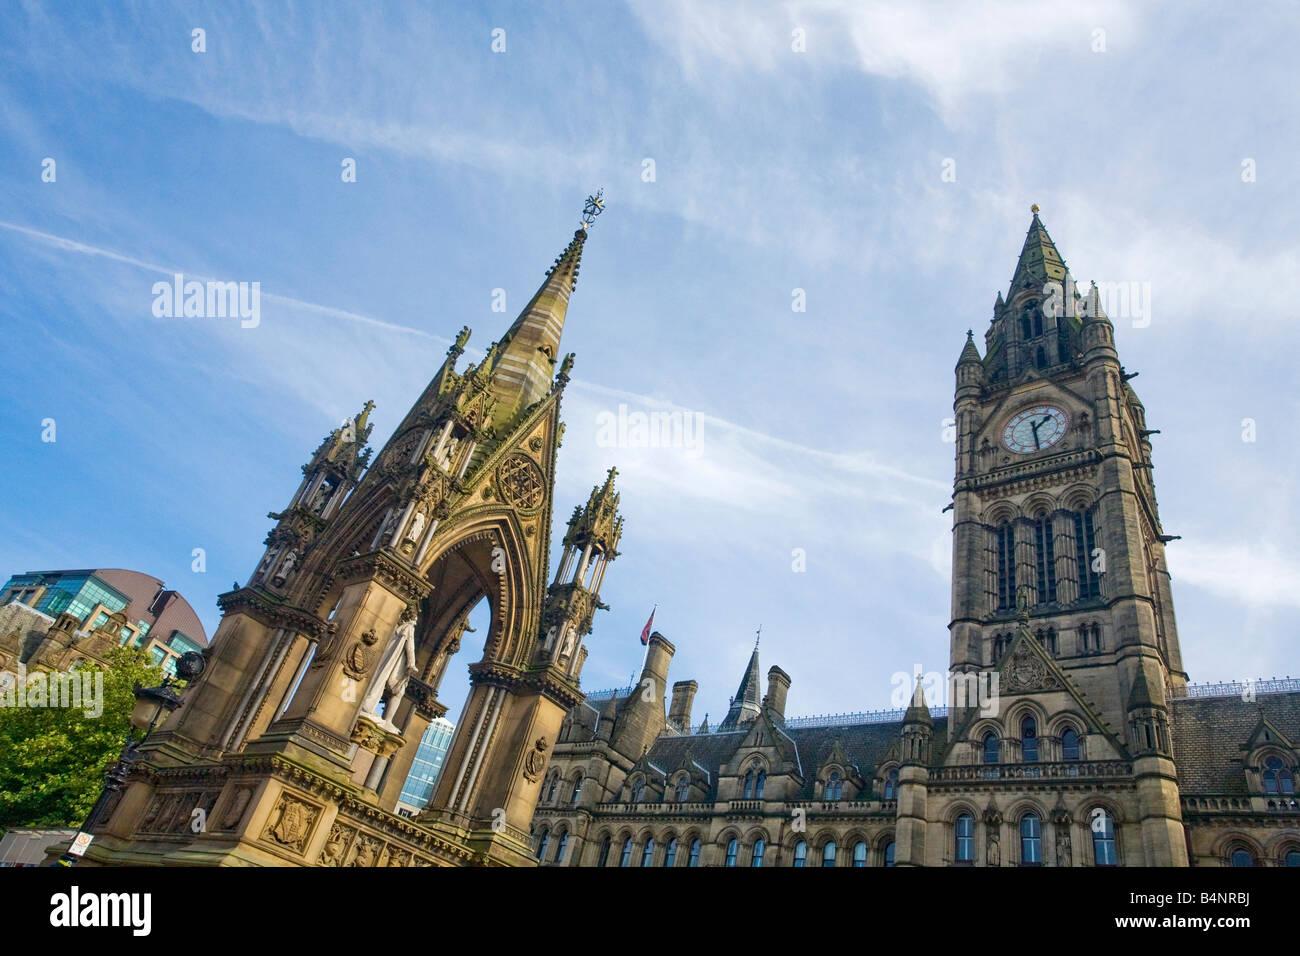 Town Hall in Albert Square Manchester city centre Lancashire England UK United Kingdom GB Great Britain British Stock Photo